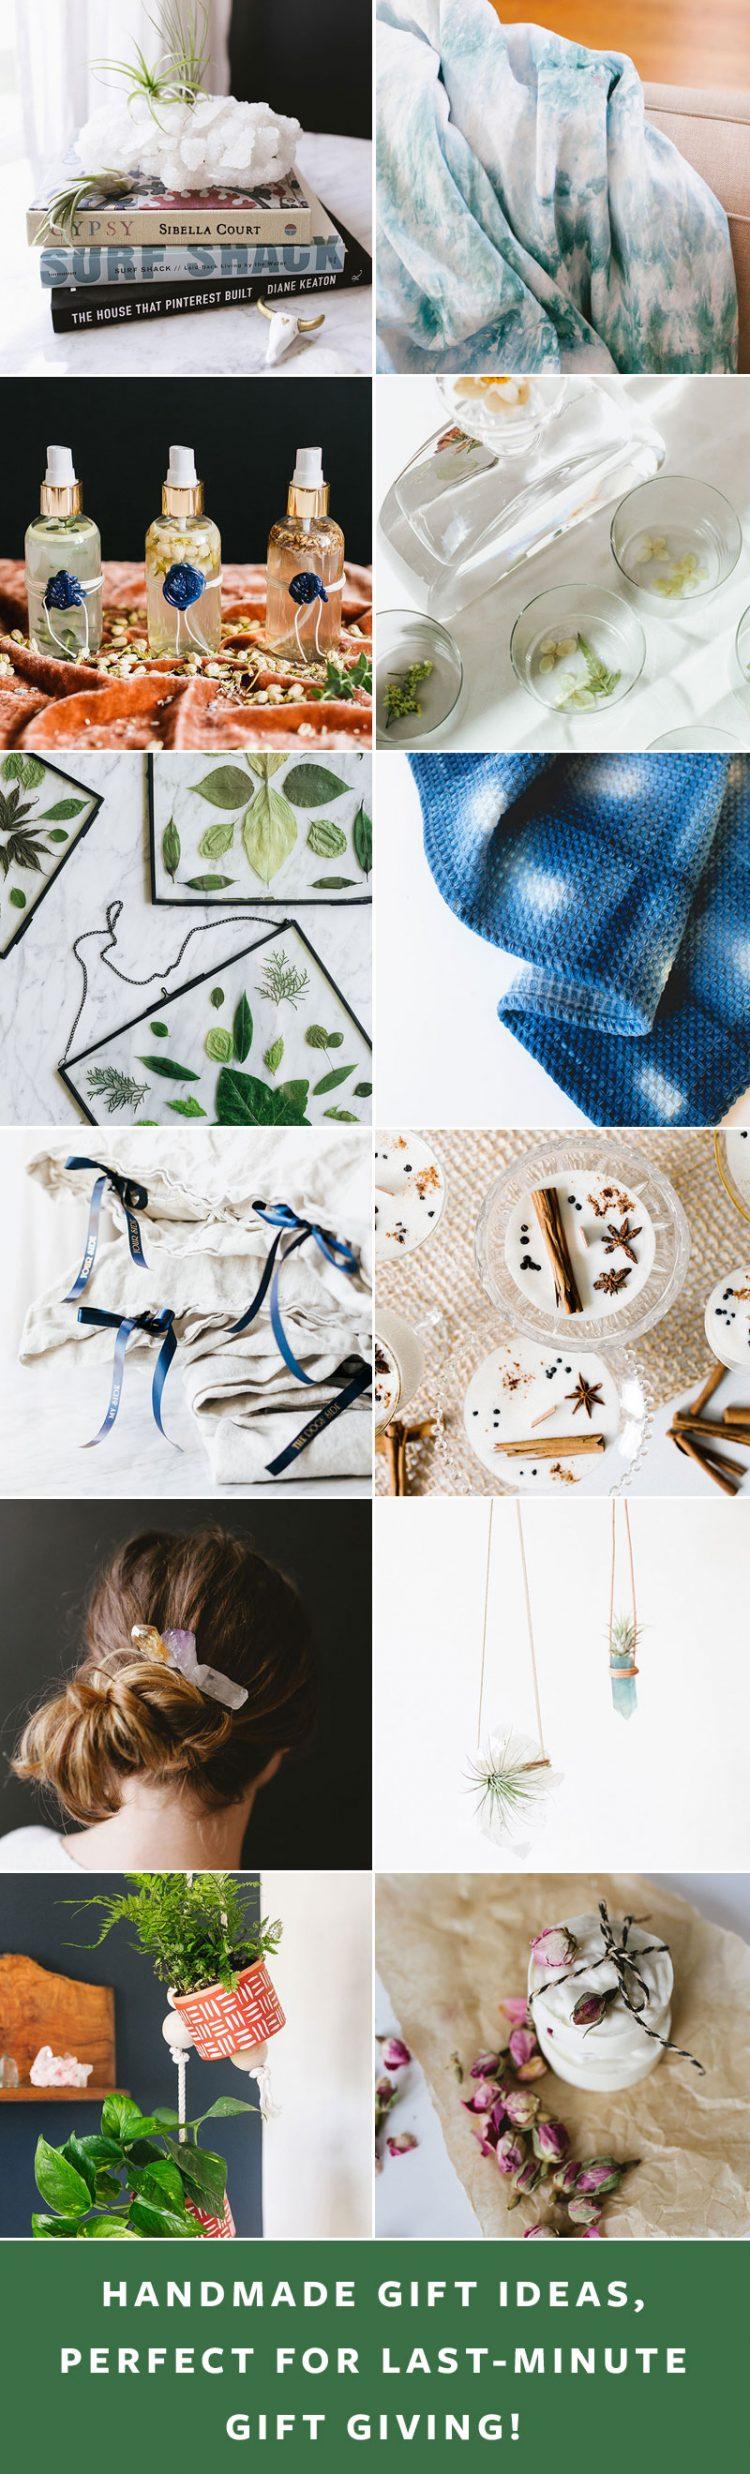 13 Last-Minute Handmade Gift Ideas! Get the full tutorial at Jojotastic.com #giftguide #handmadegifts #DIYgifts #christmasgifts #giftideas #diy